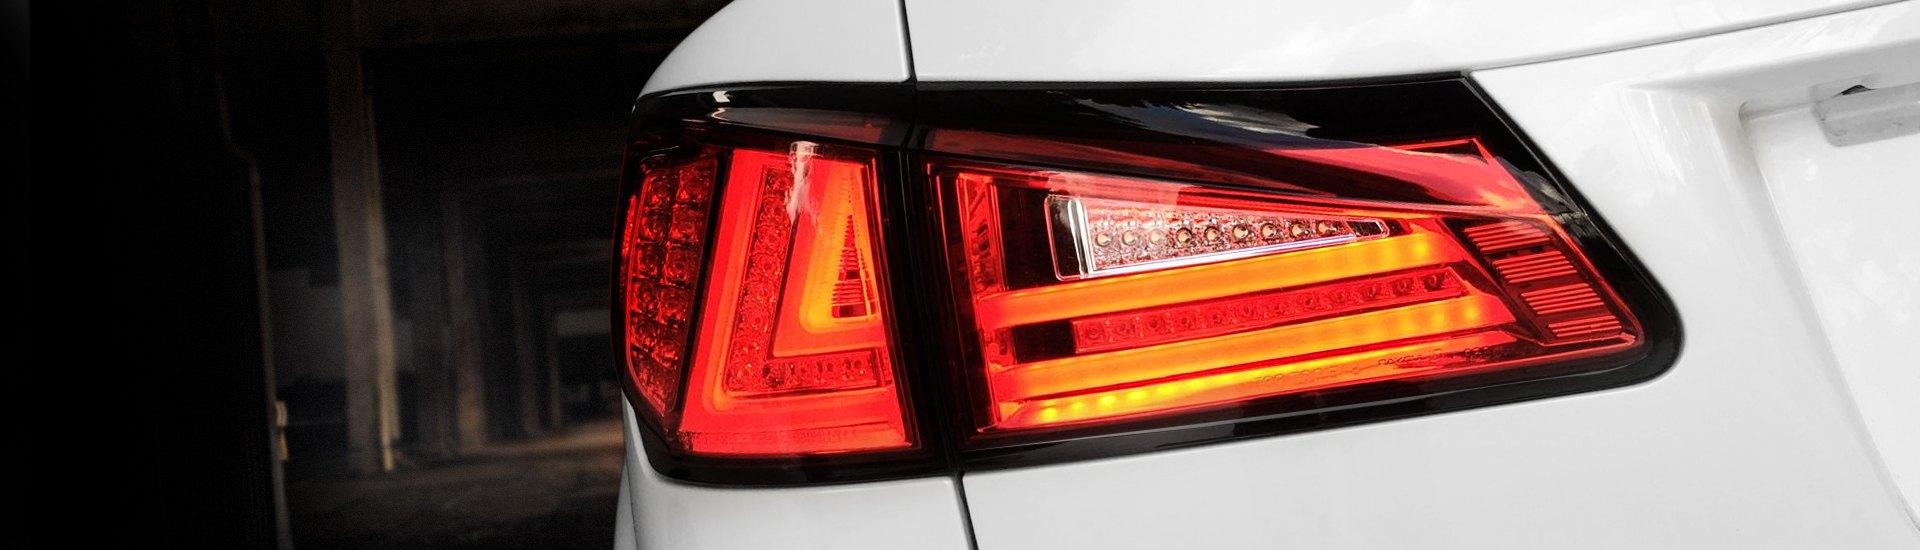 Tail Lights   Custom & Factory Tail Lights at CARiD com